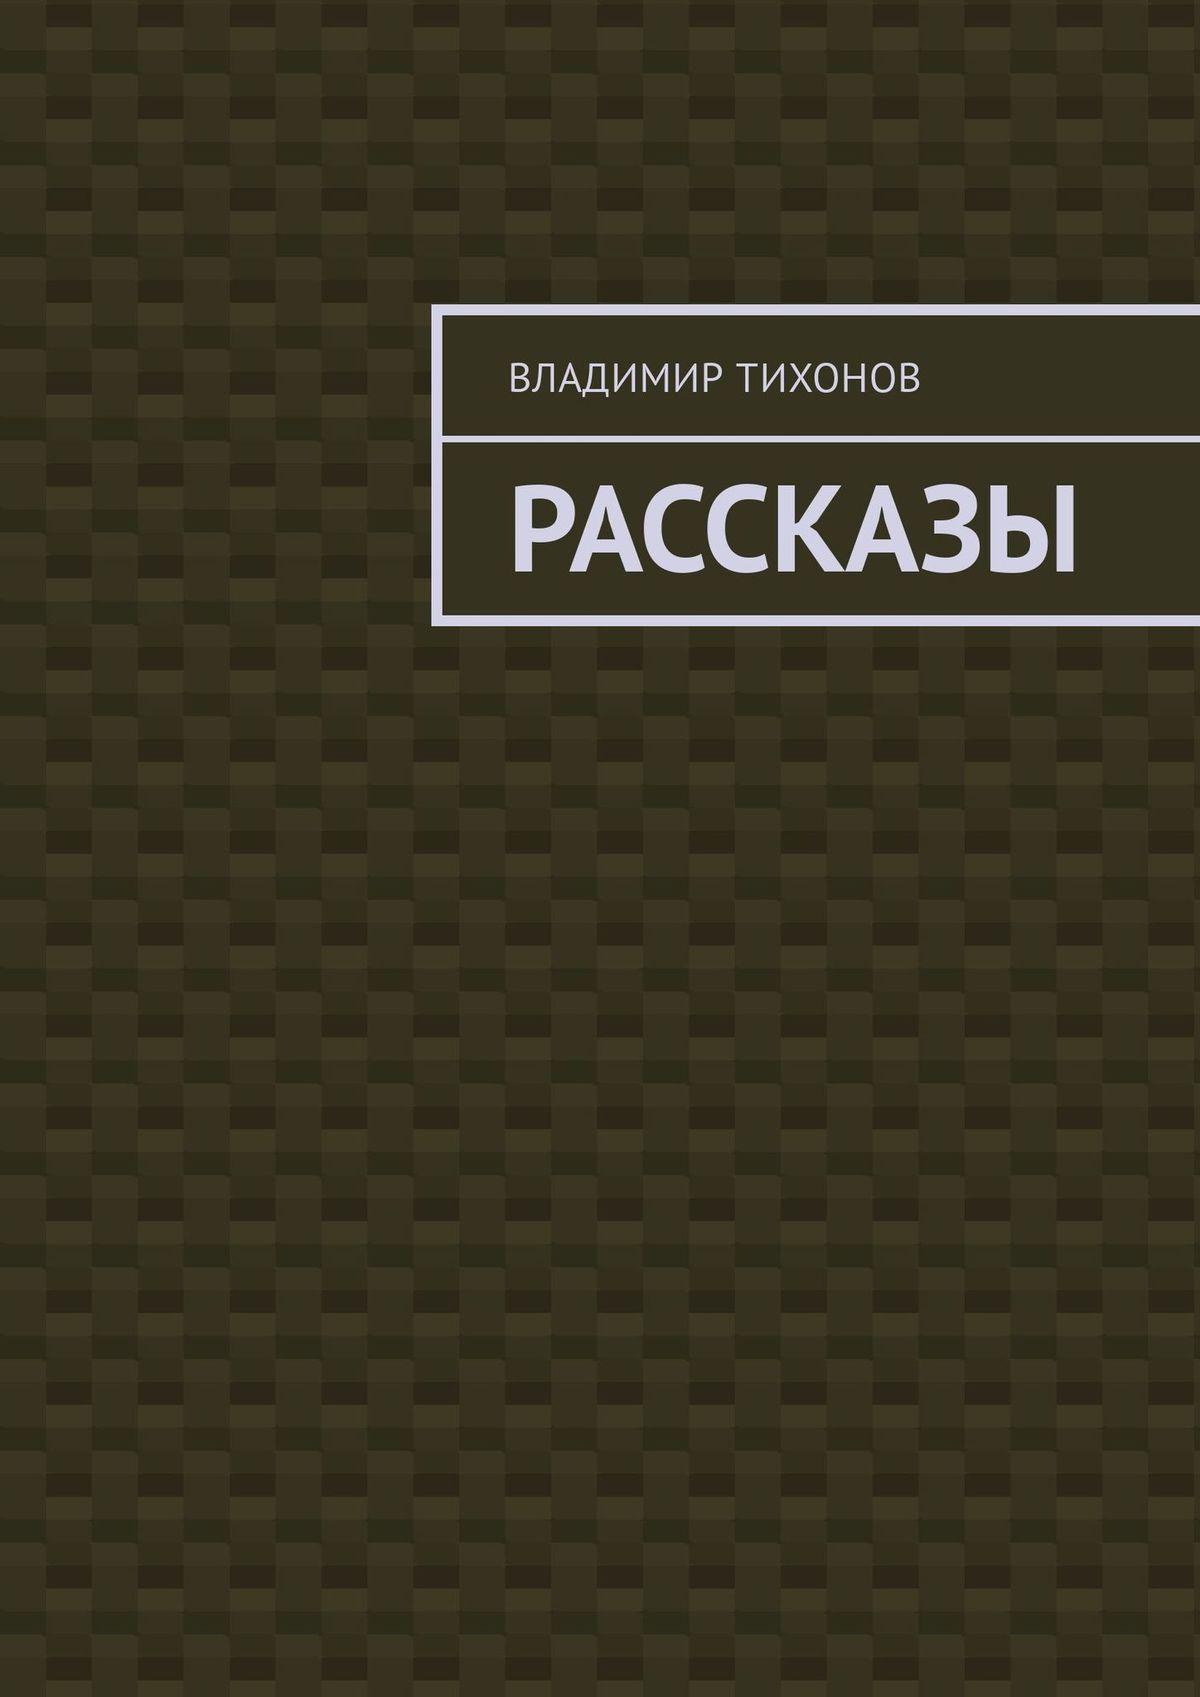 Владимир Тихонов Рассказы владимир тихонов любовь изстарого парка